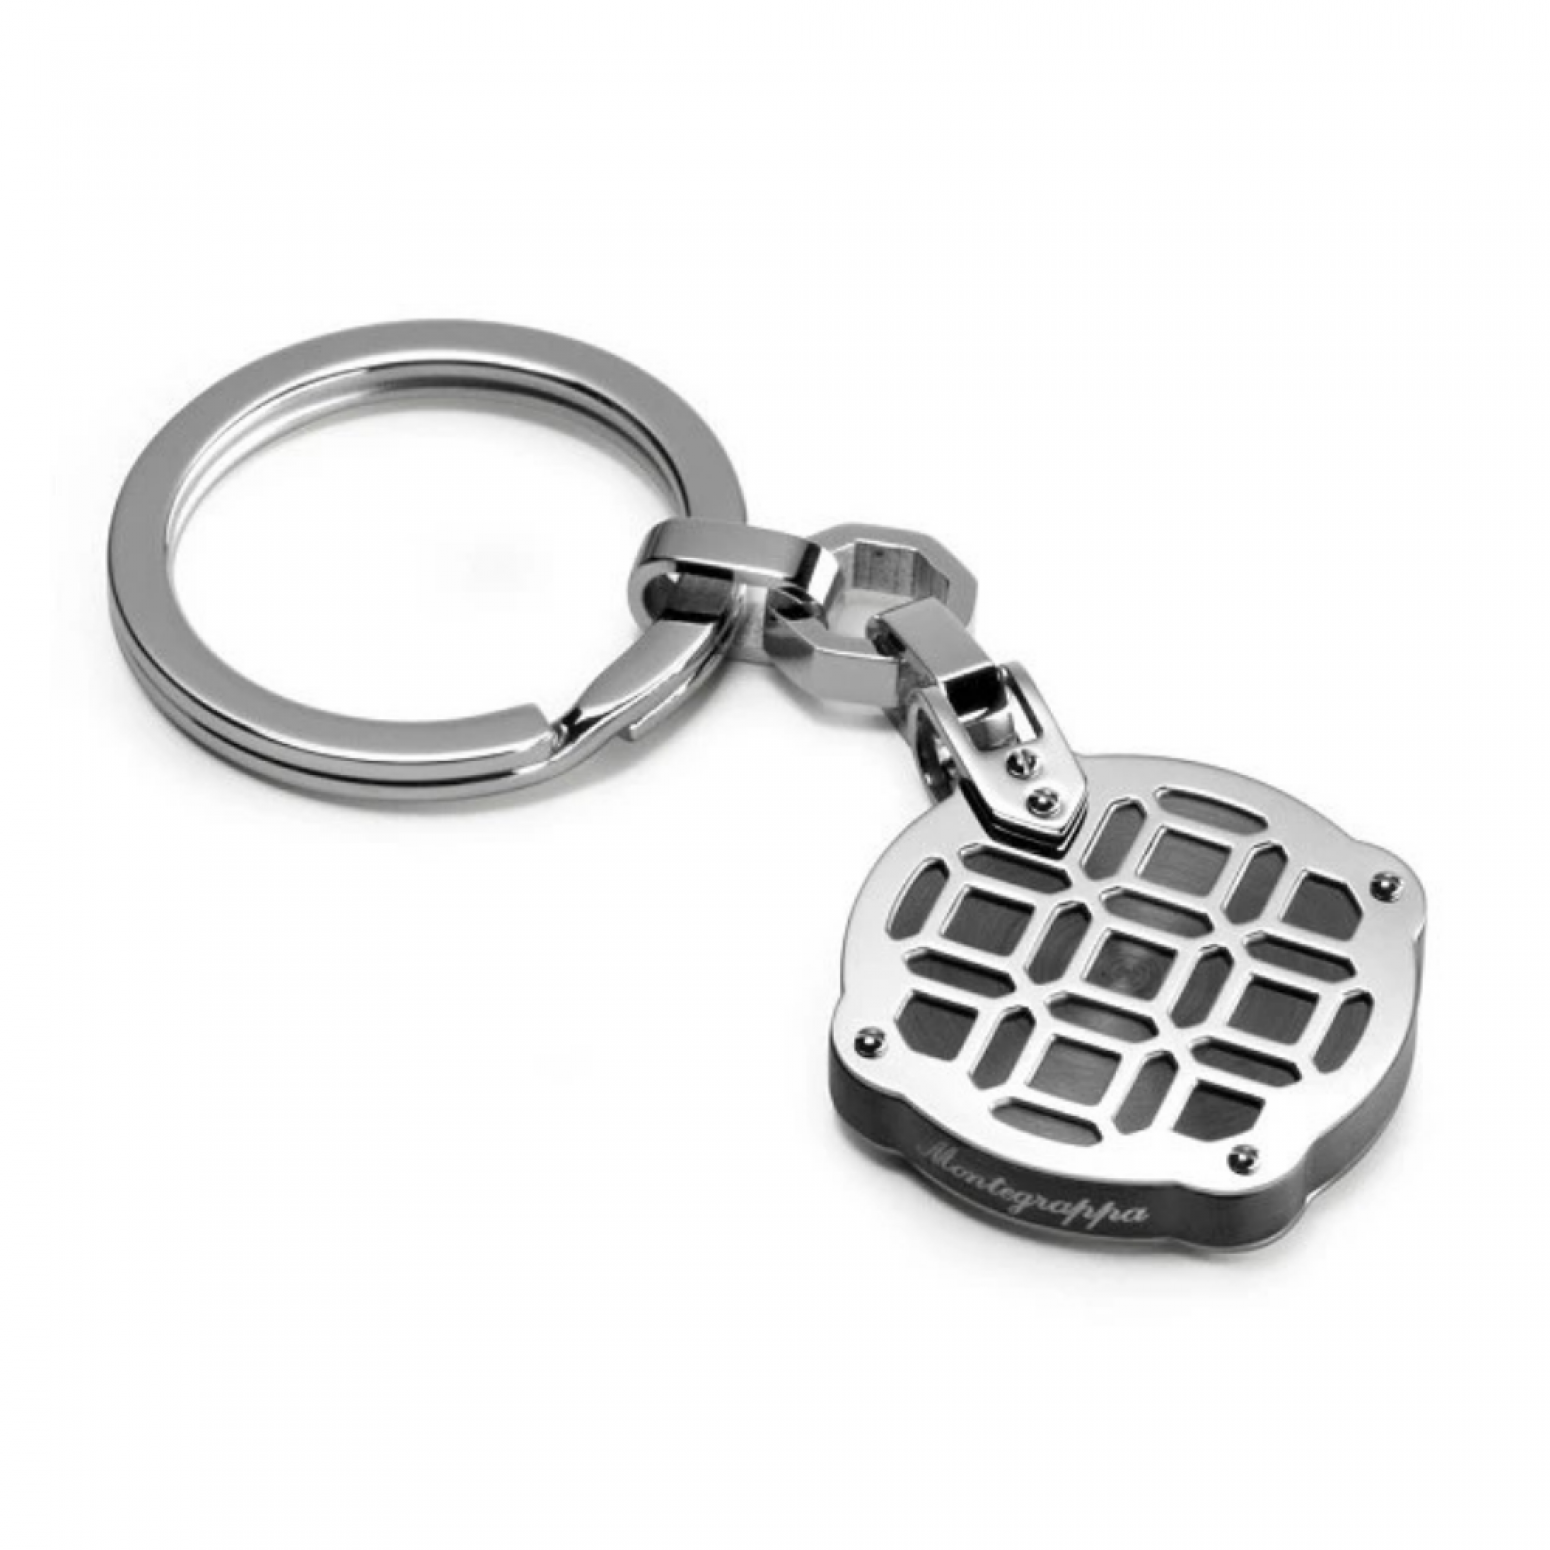 Montegrappa key ring, Filigree Anahtarlık IDOMKRPR, kl0074 LUXURY GIFTS Κοσμηματα - chrilia.gr